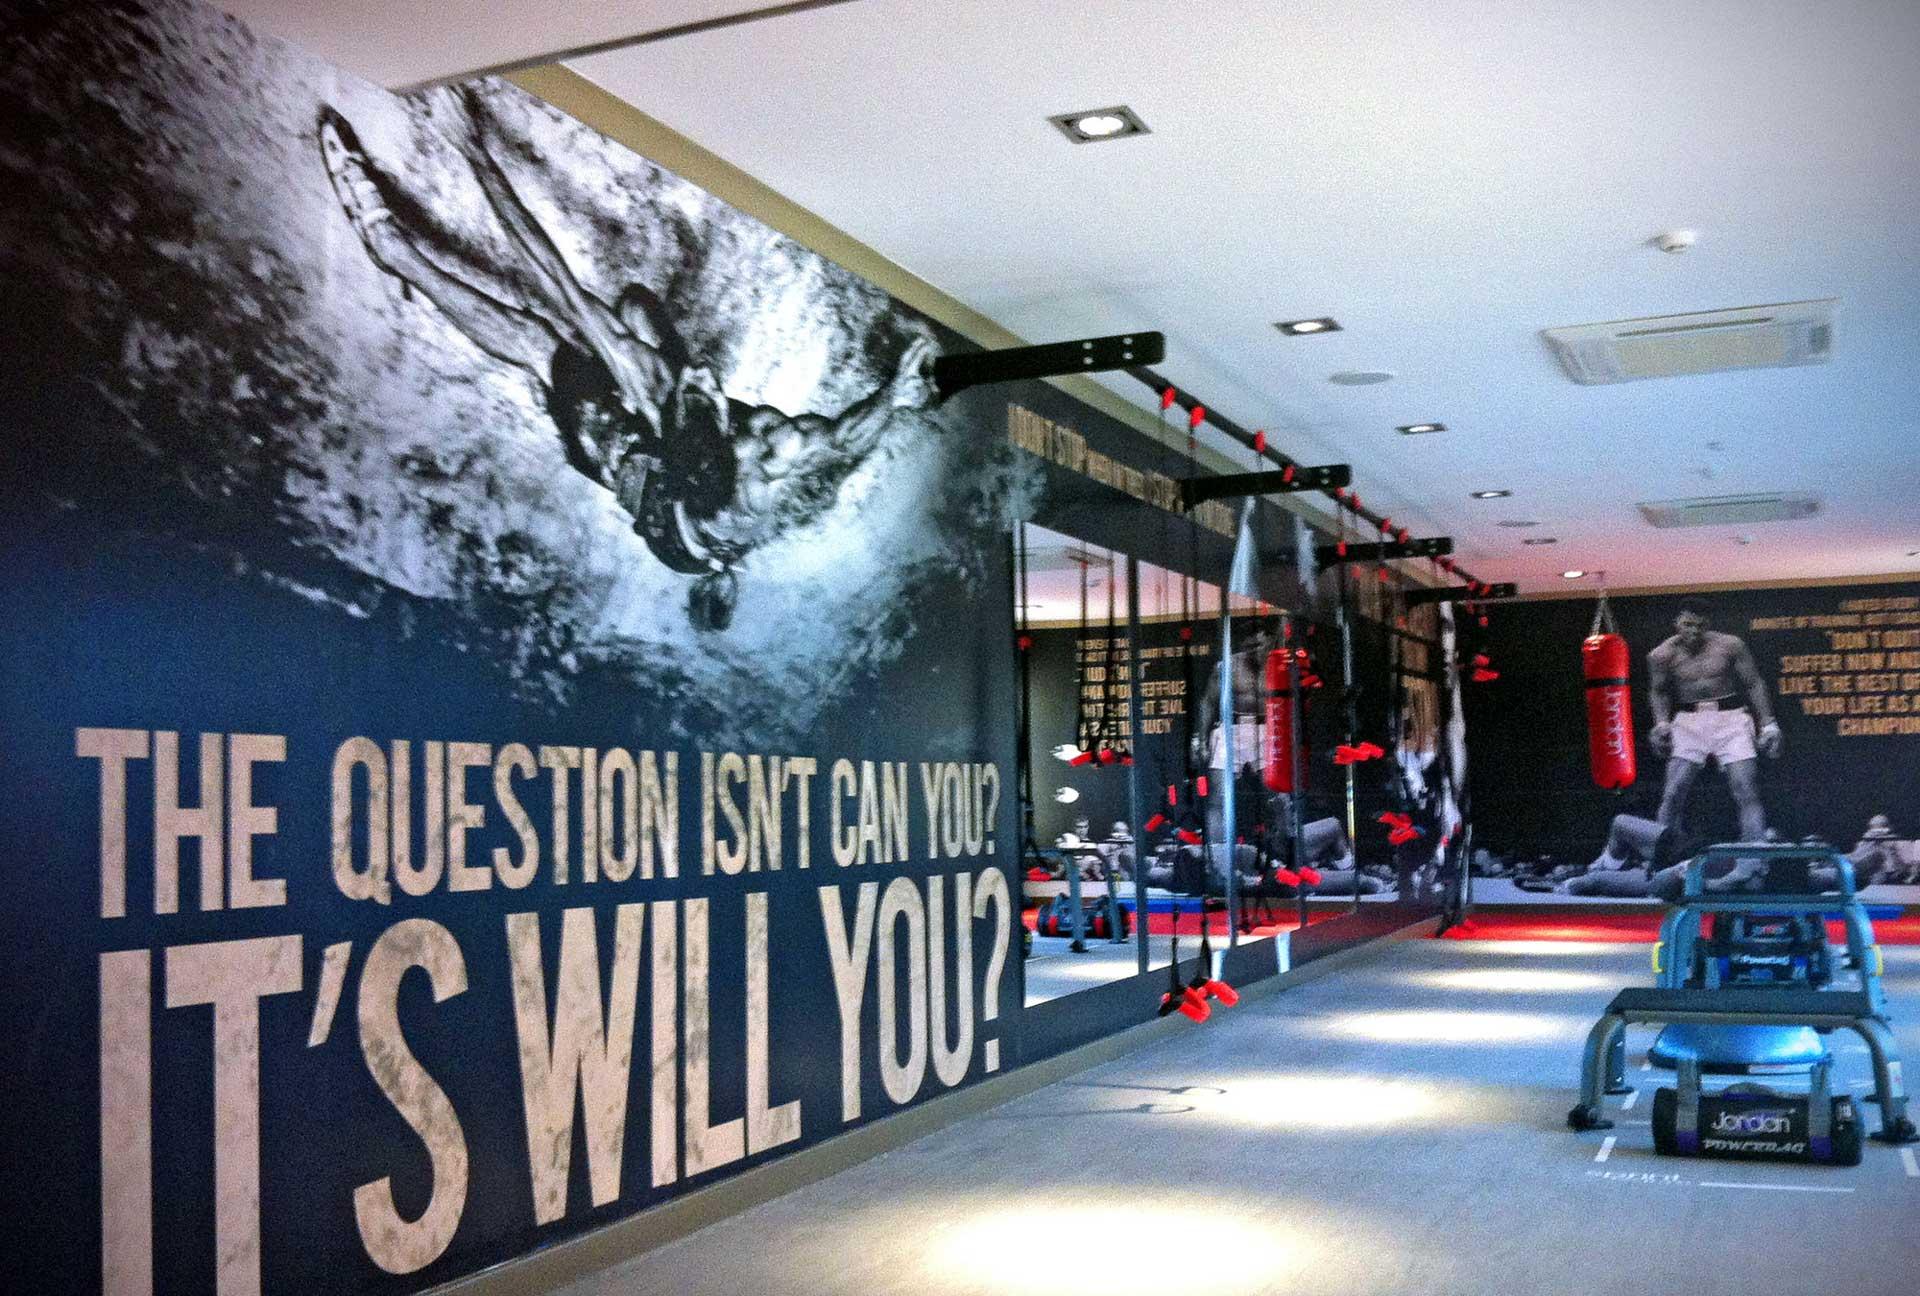 Wallpaper - Gym Wallpaper Artwork